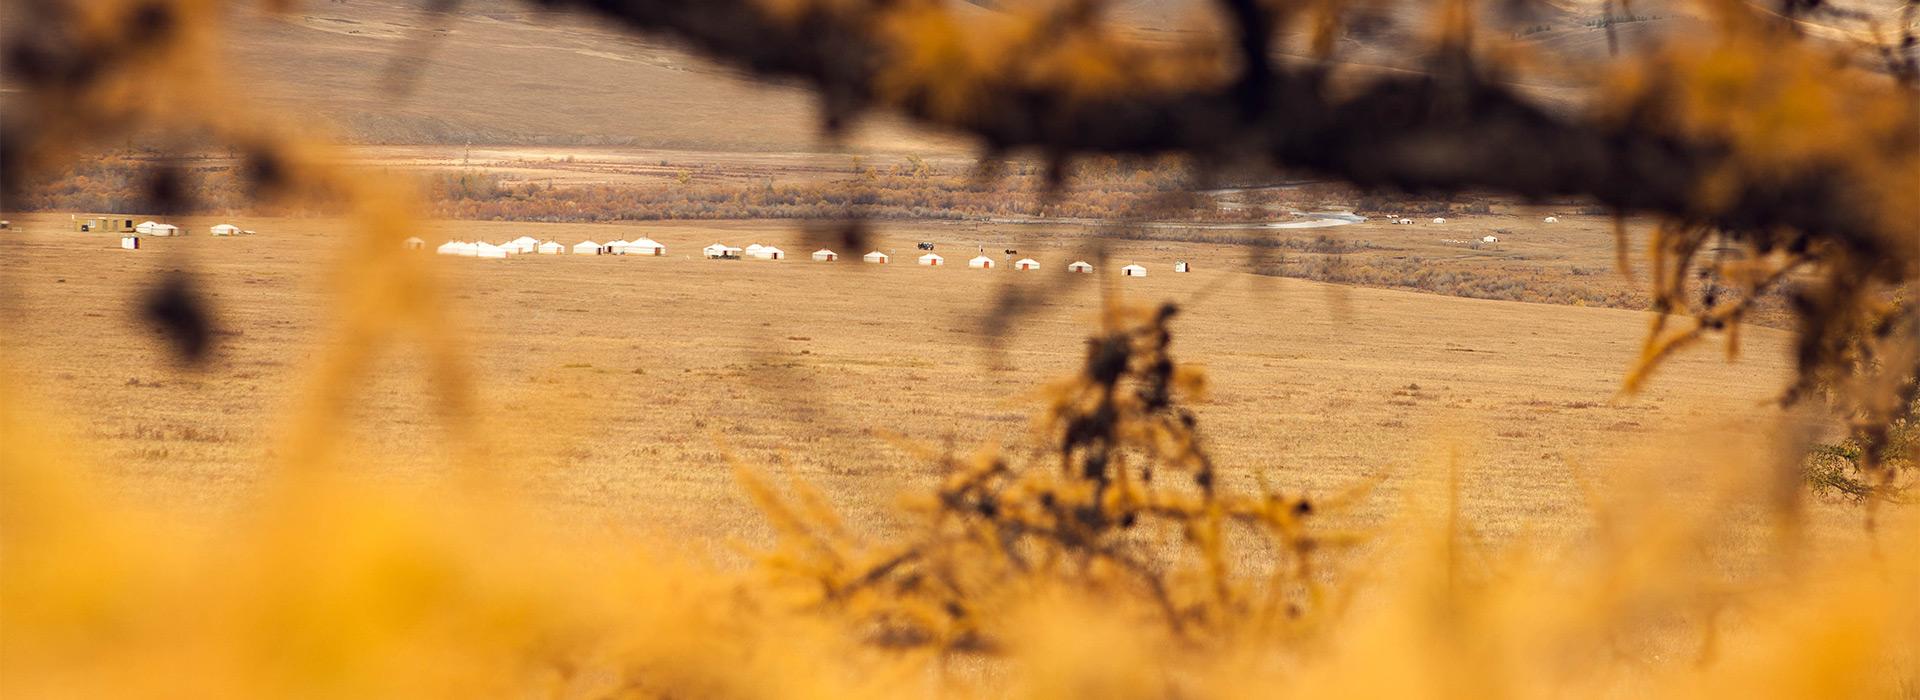 autumn-season-in-jalman-meadows-wilderness-ger-camp